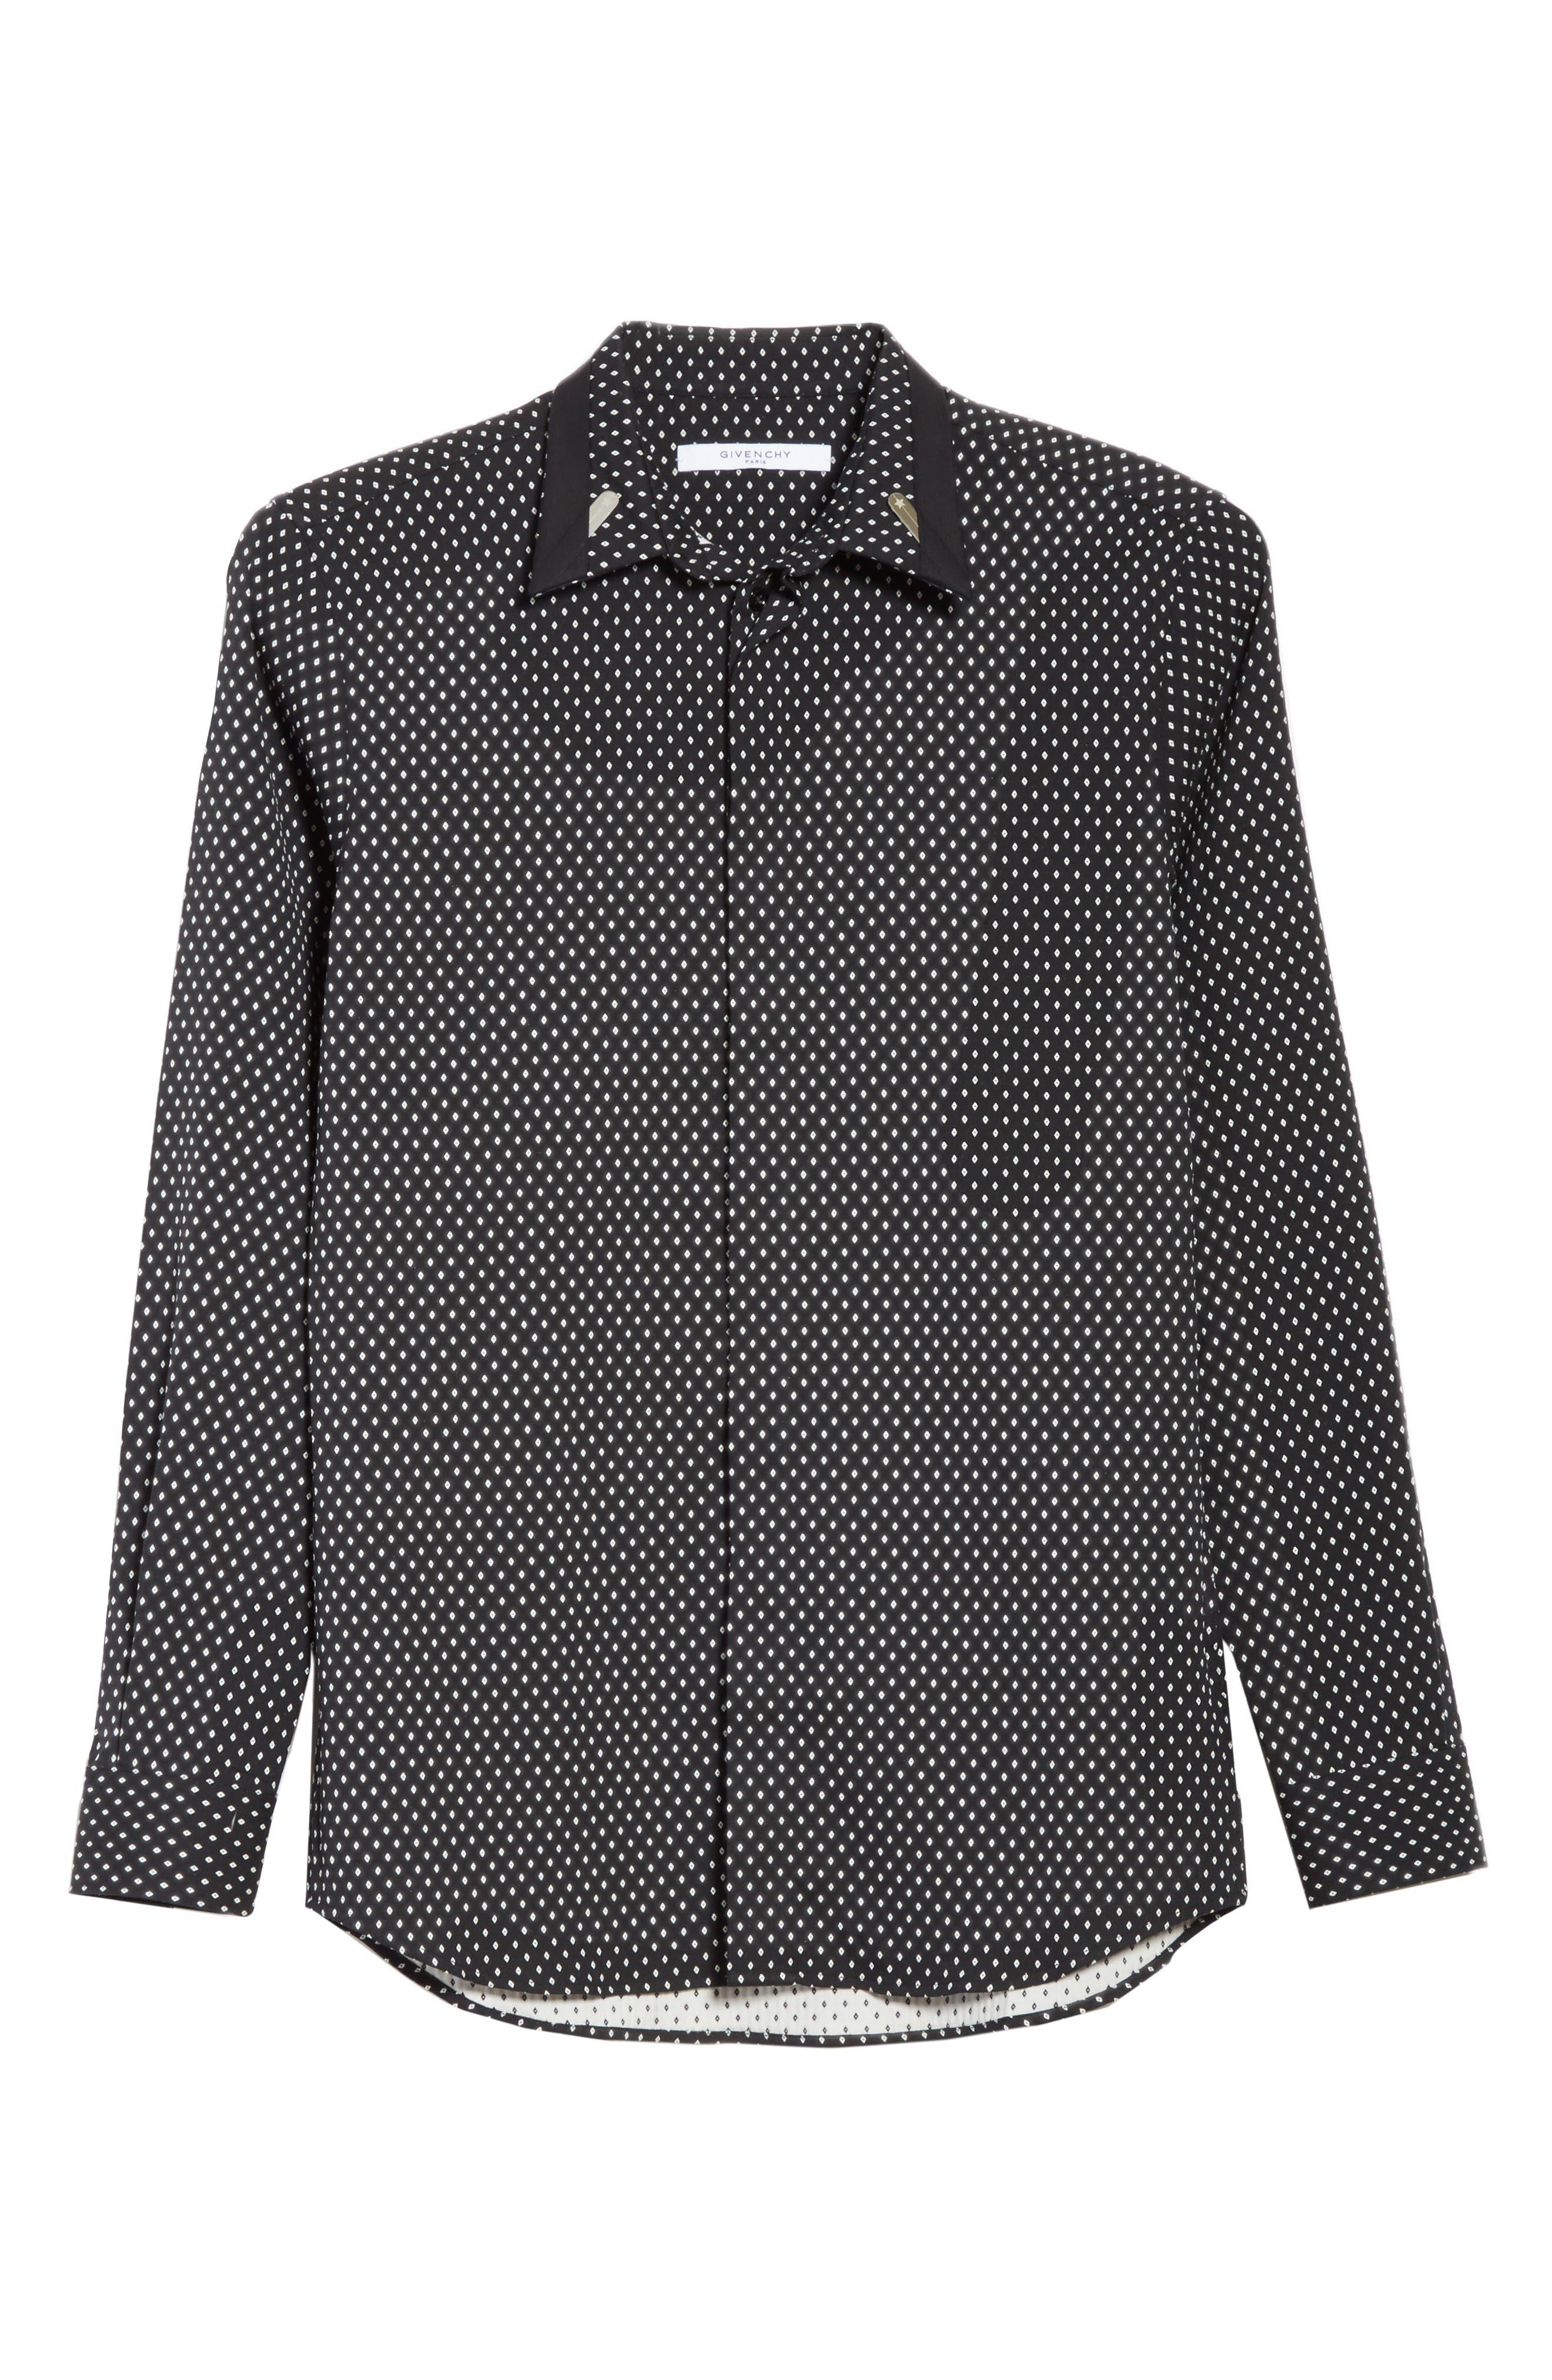 Jacquard Collar Stay Shirt,                             Alternate thumbnail 6, color,                             001